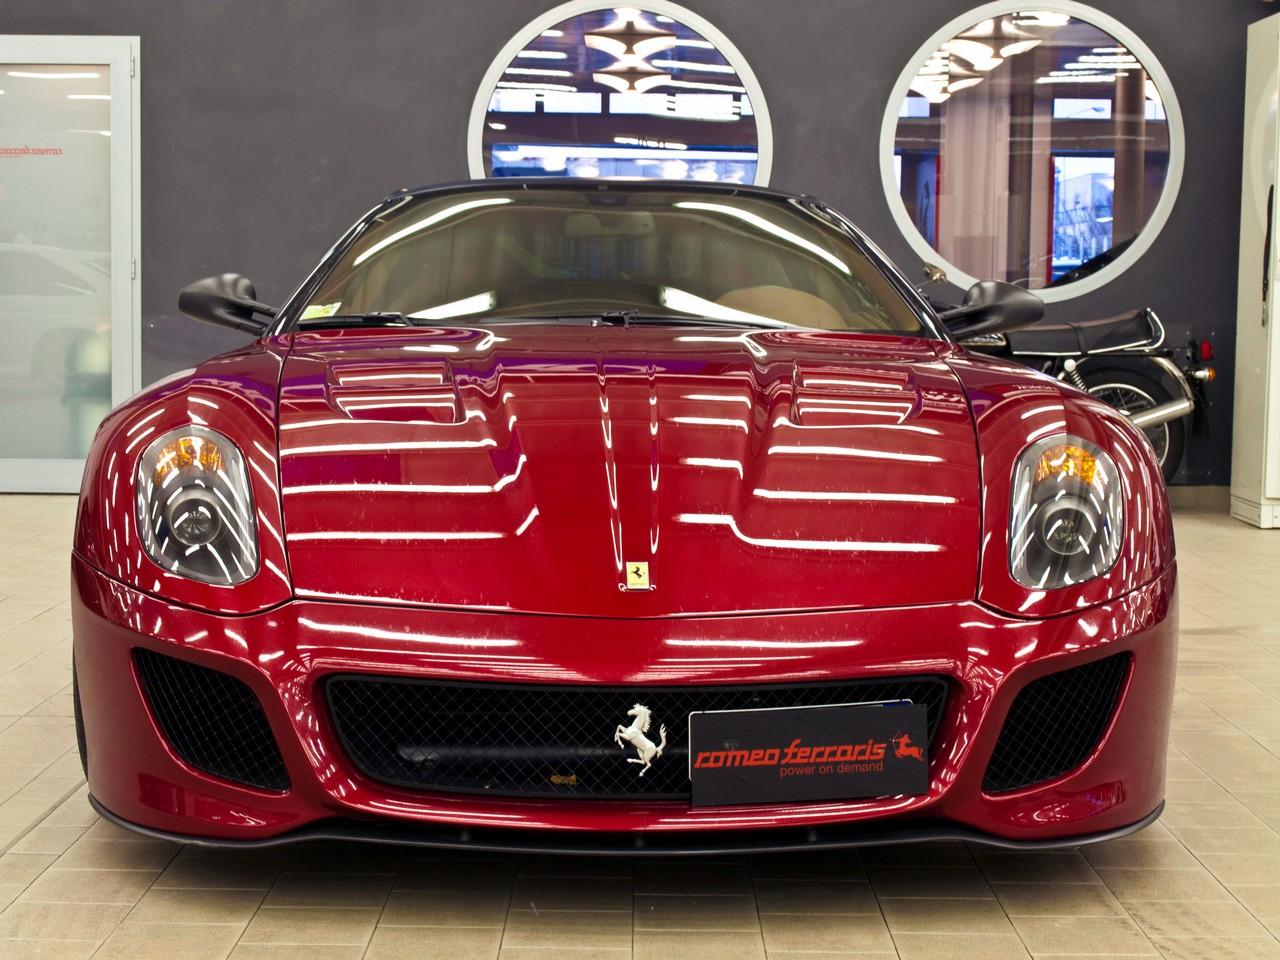 http://images.caradisiac.com/images/7/4/5/9/77459/S0-Ferrari-599-GTO-par-Romeo-Ferraris-pour-40-ch-de-plus-258689.jpg